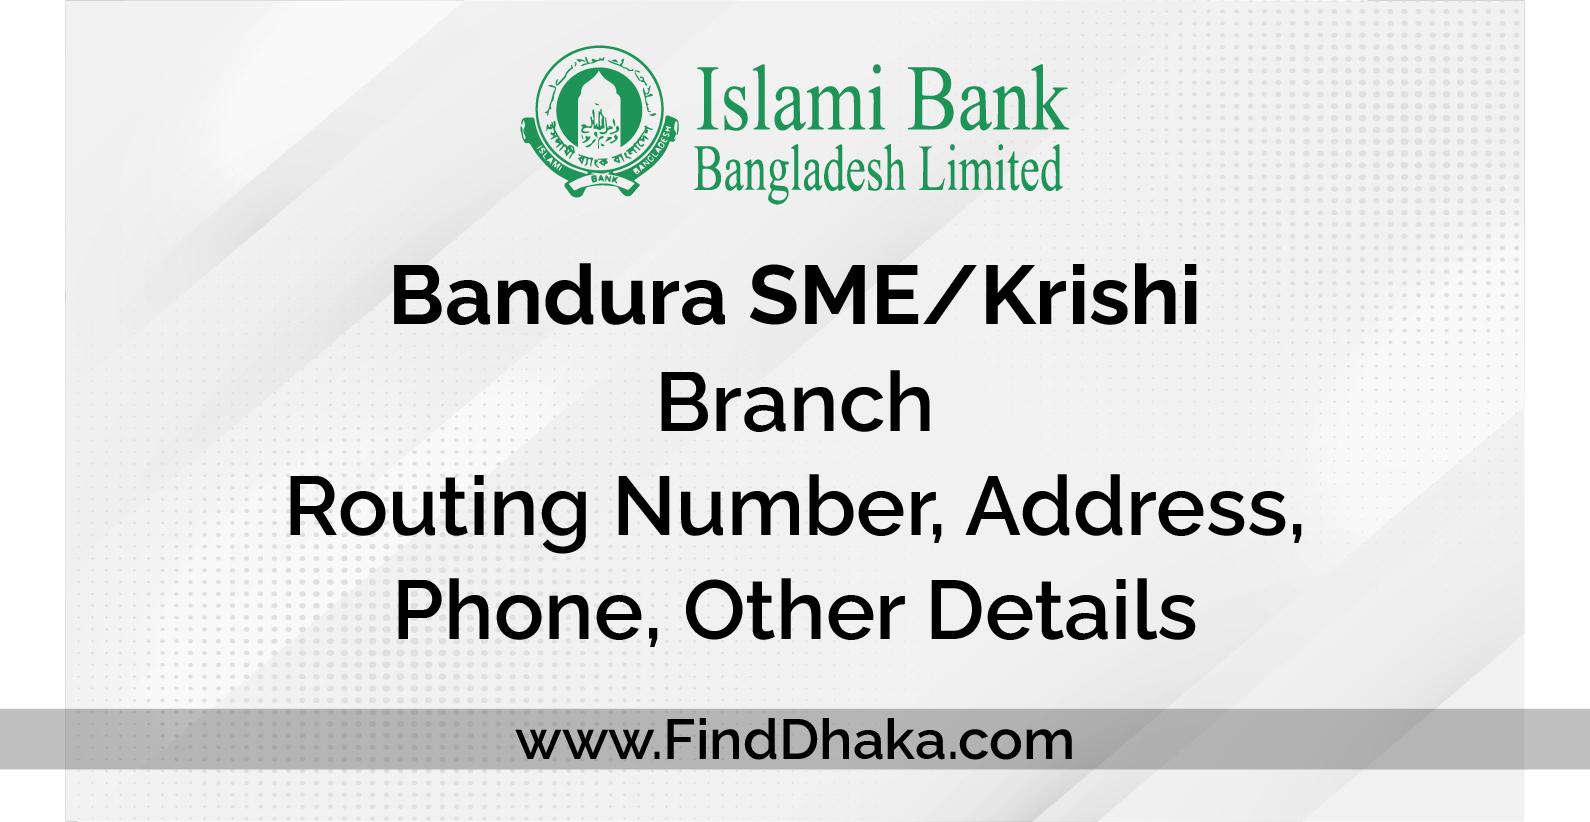 Islami Bank info007000 2